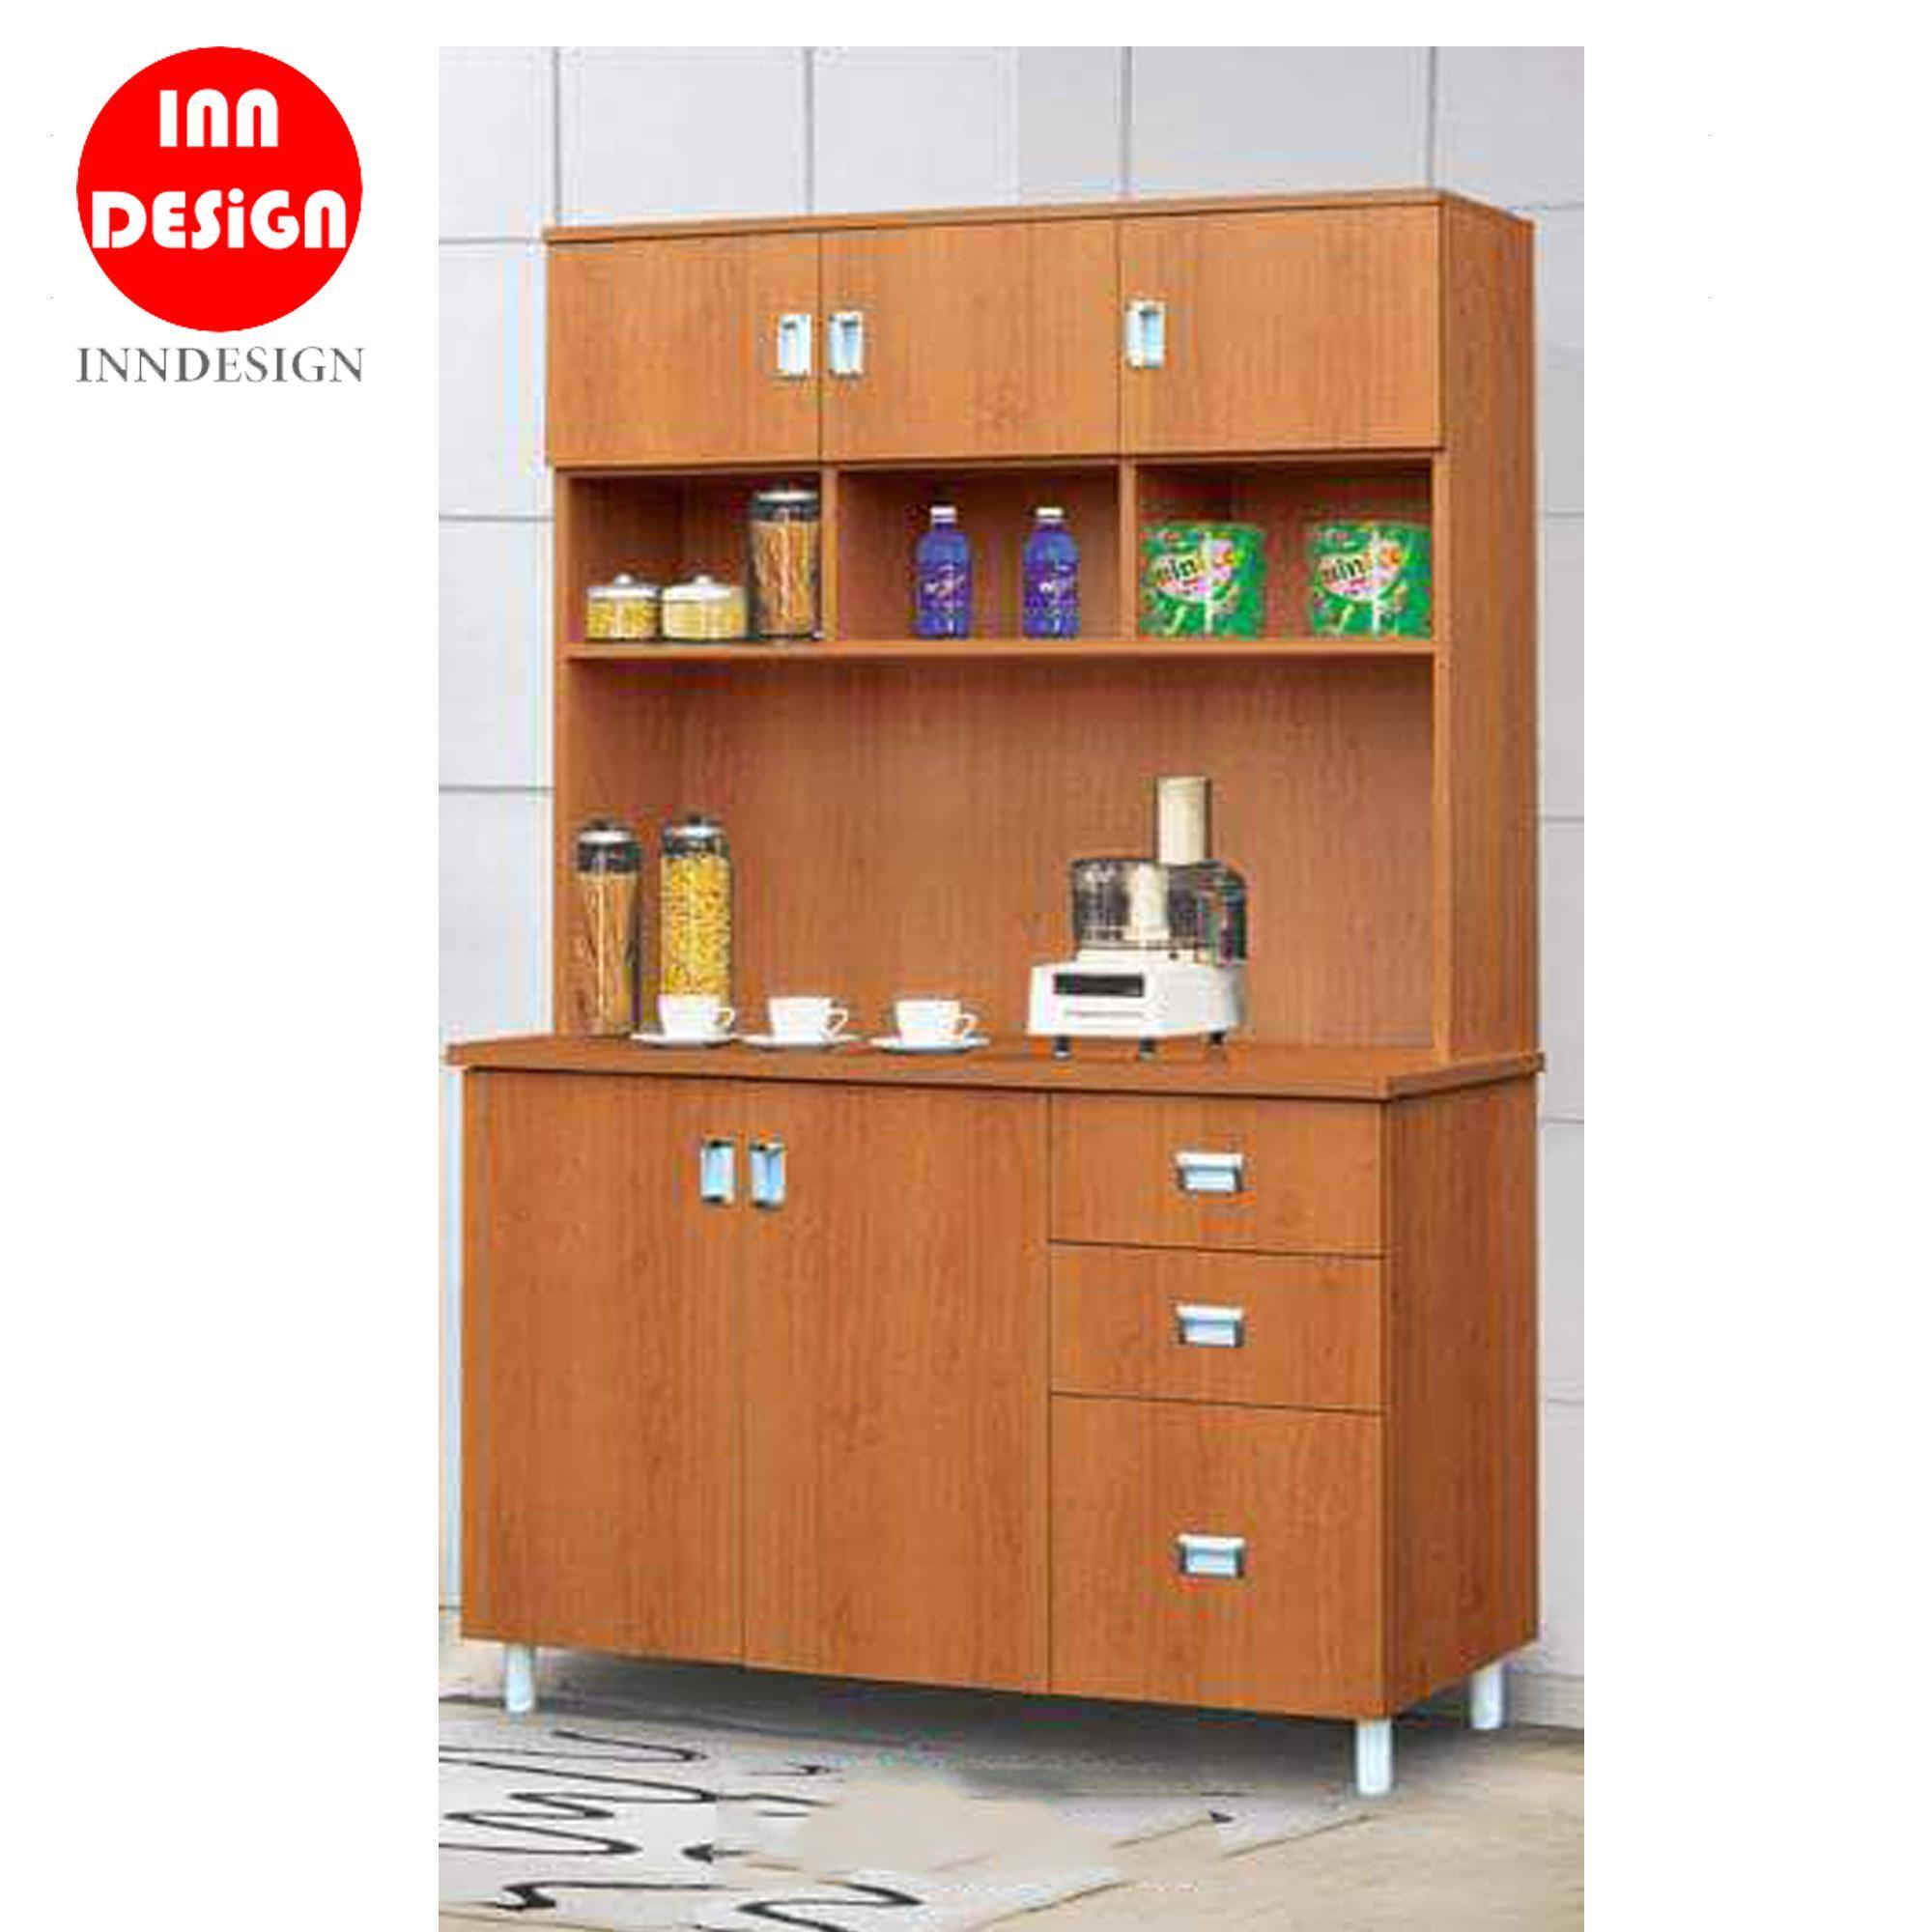 Elvie Kitchen Cabinet (Free Delivery and Installation)